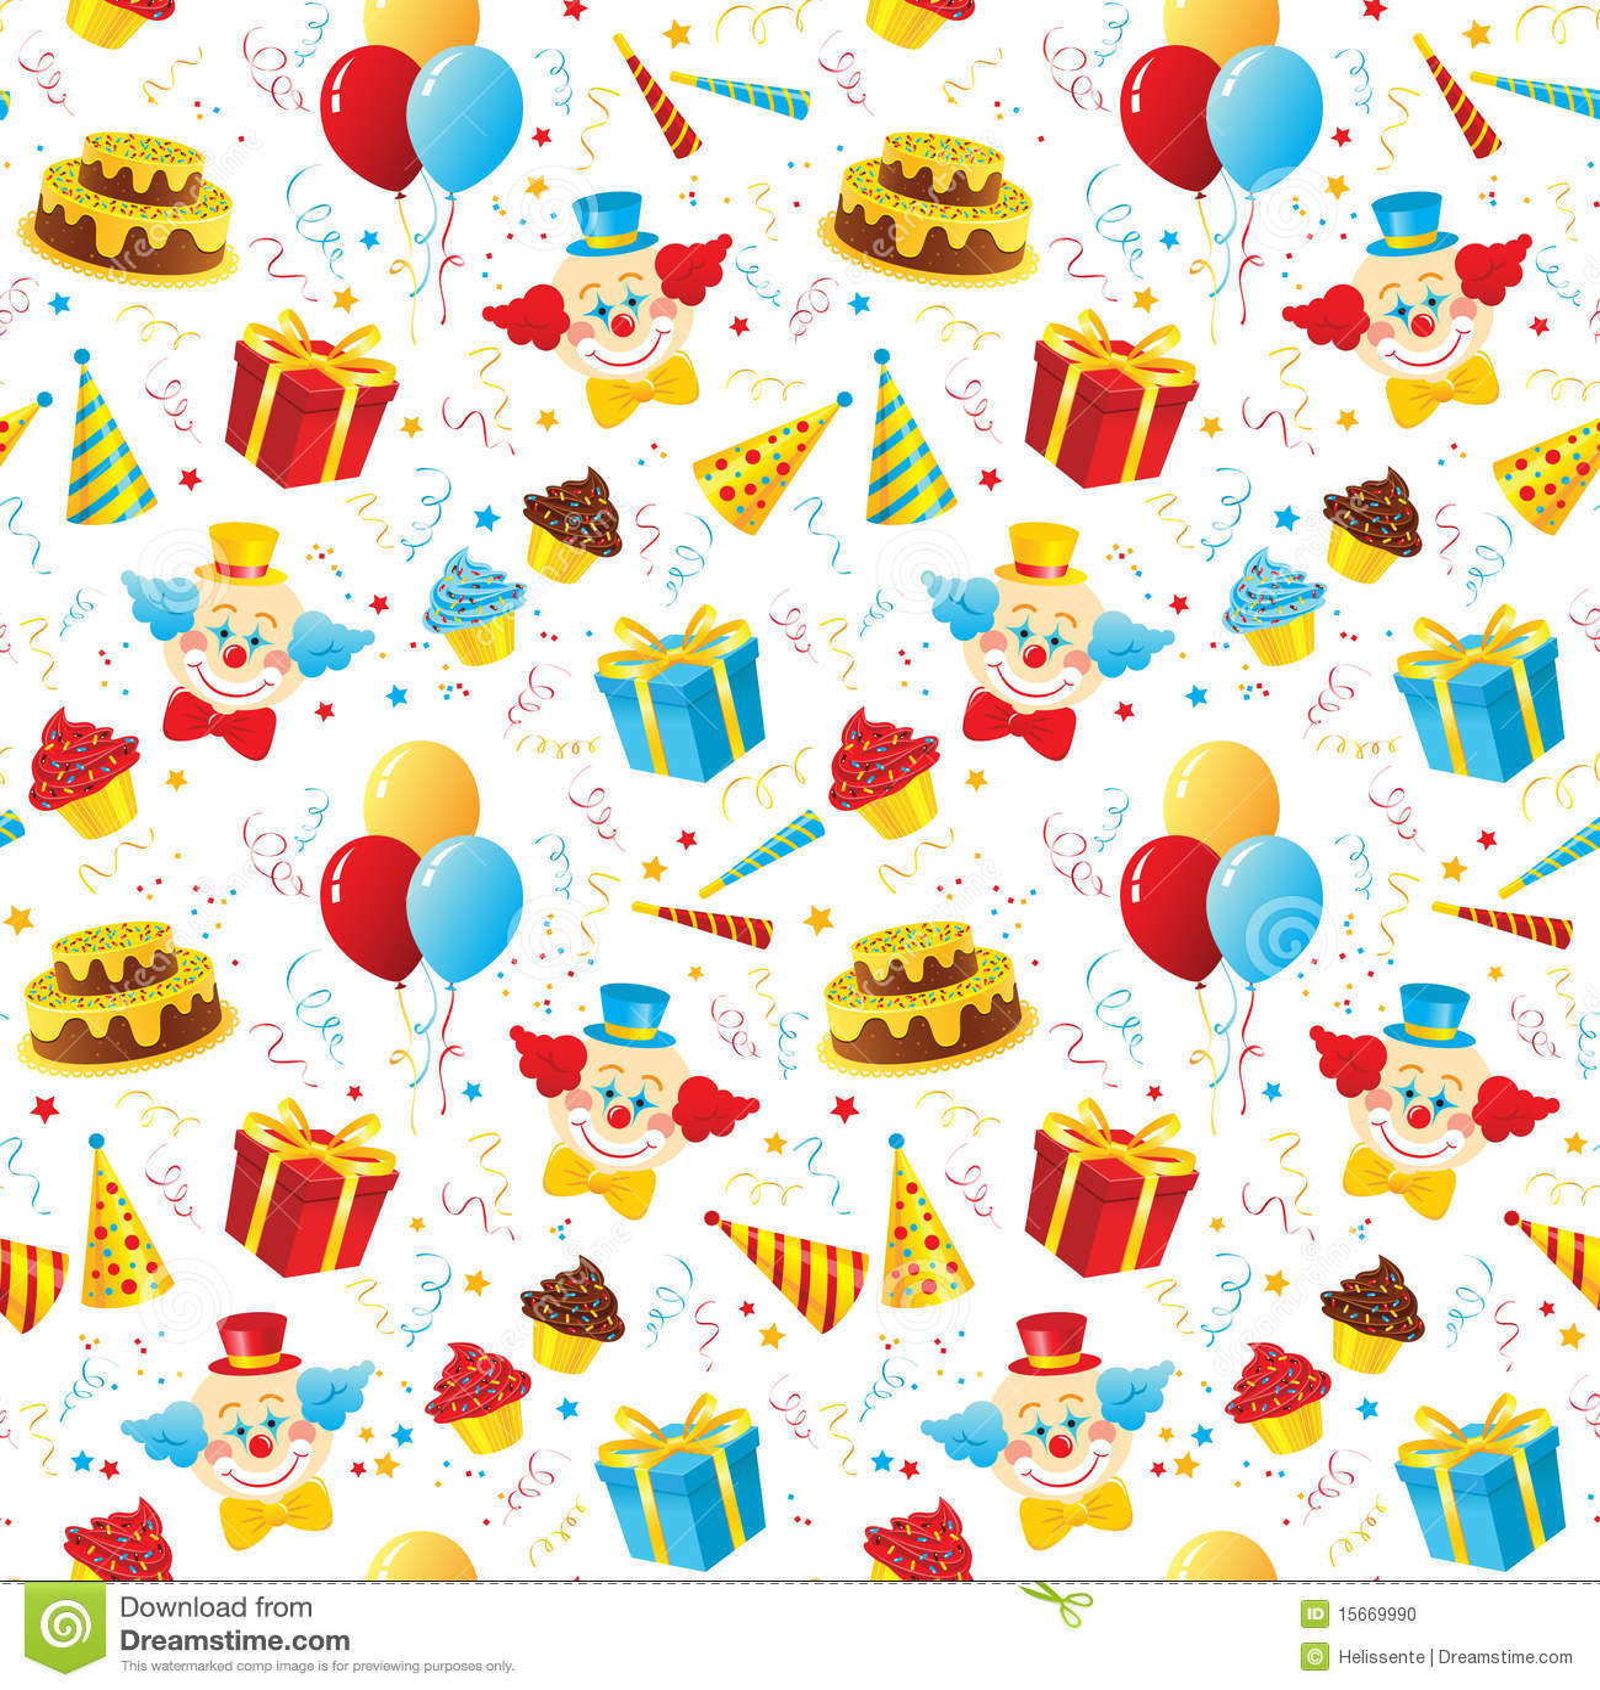 Birthday Party Seamless Pattern Stock Photo - Image: 15669990